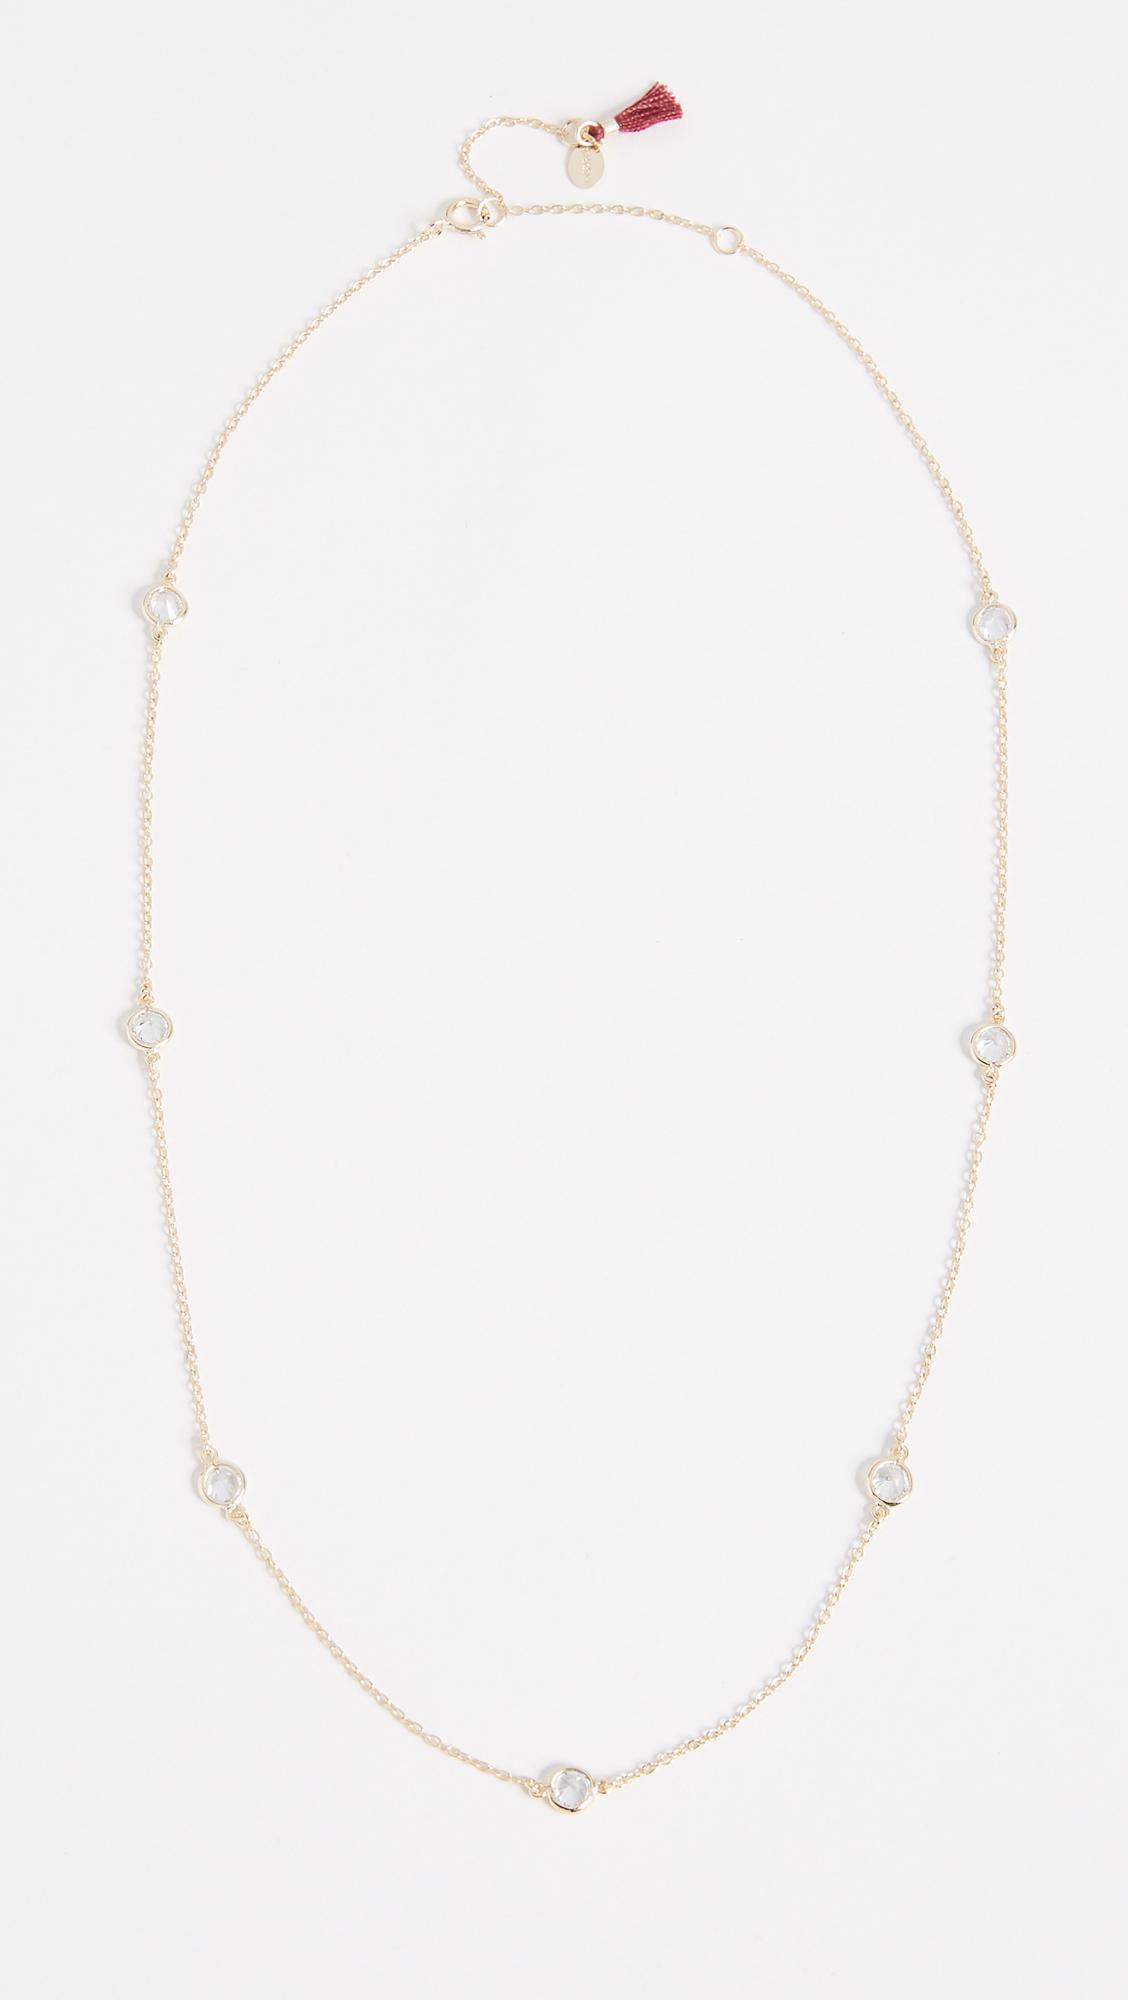 Diamond Bar Choker in Metallic Gold Shashi GRjoe8uMa